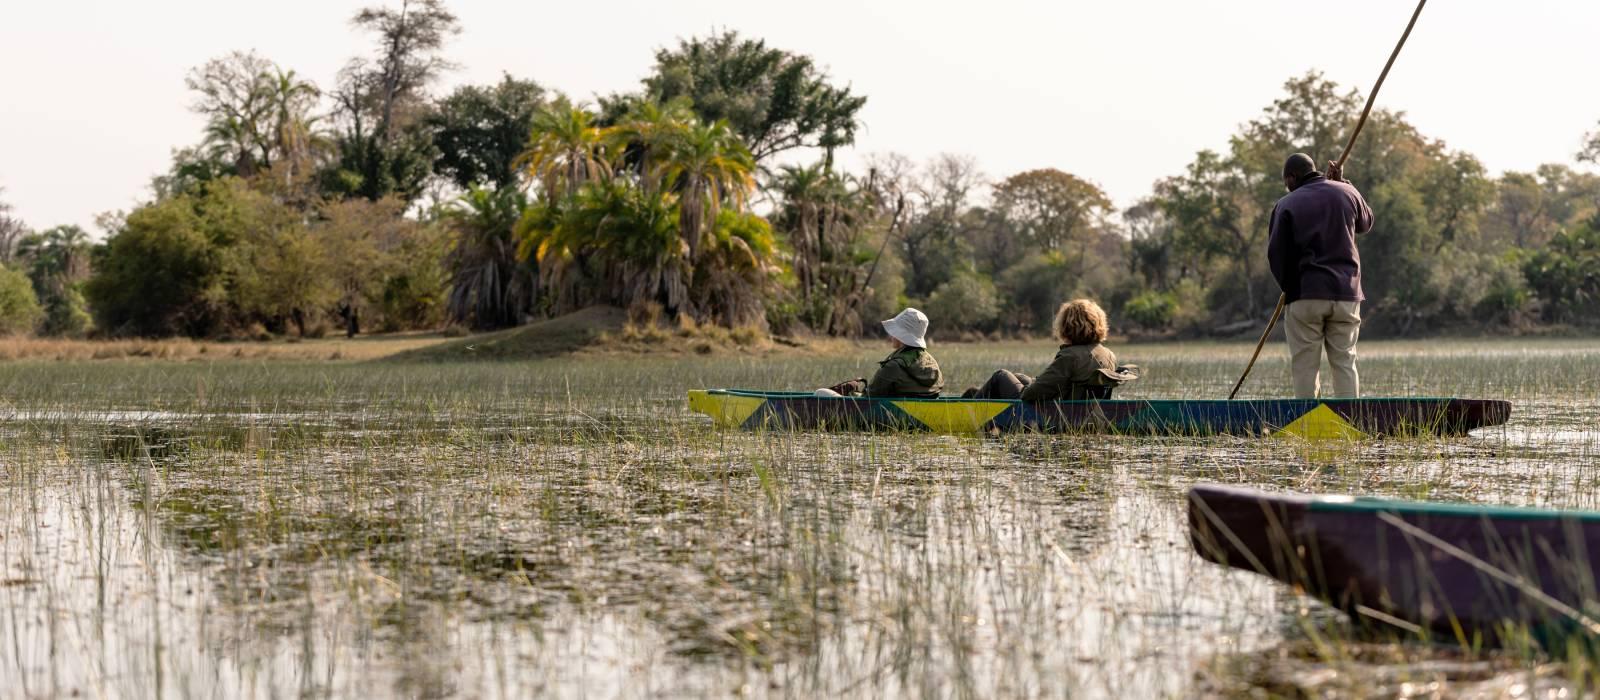 Mokoro ride in the okawango delta in Botswana, Africa